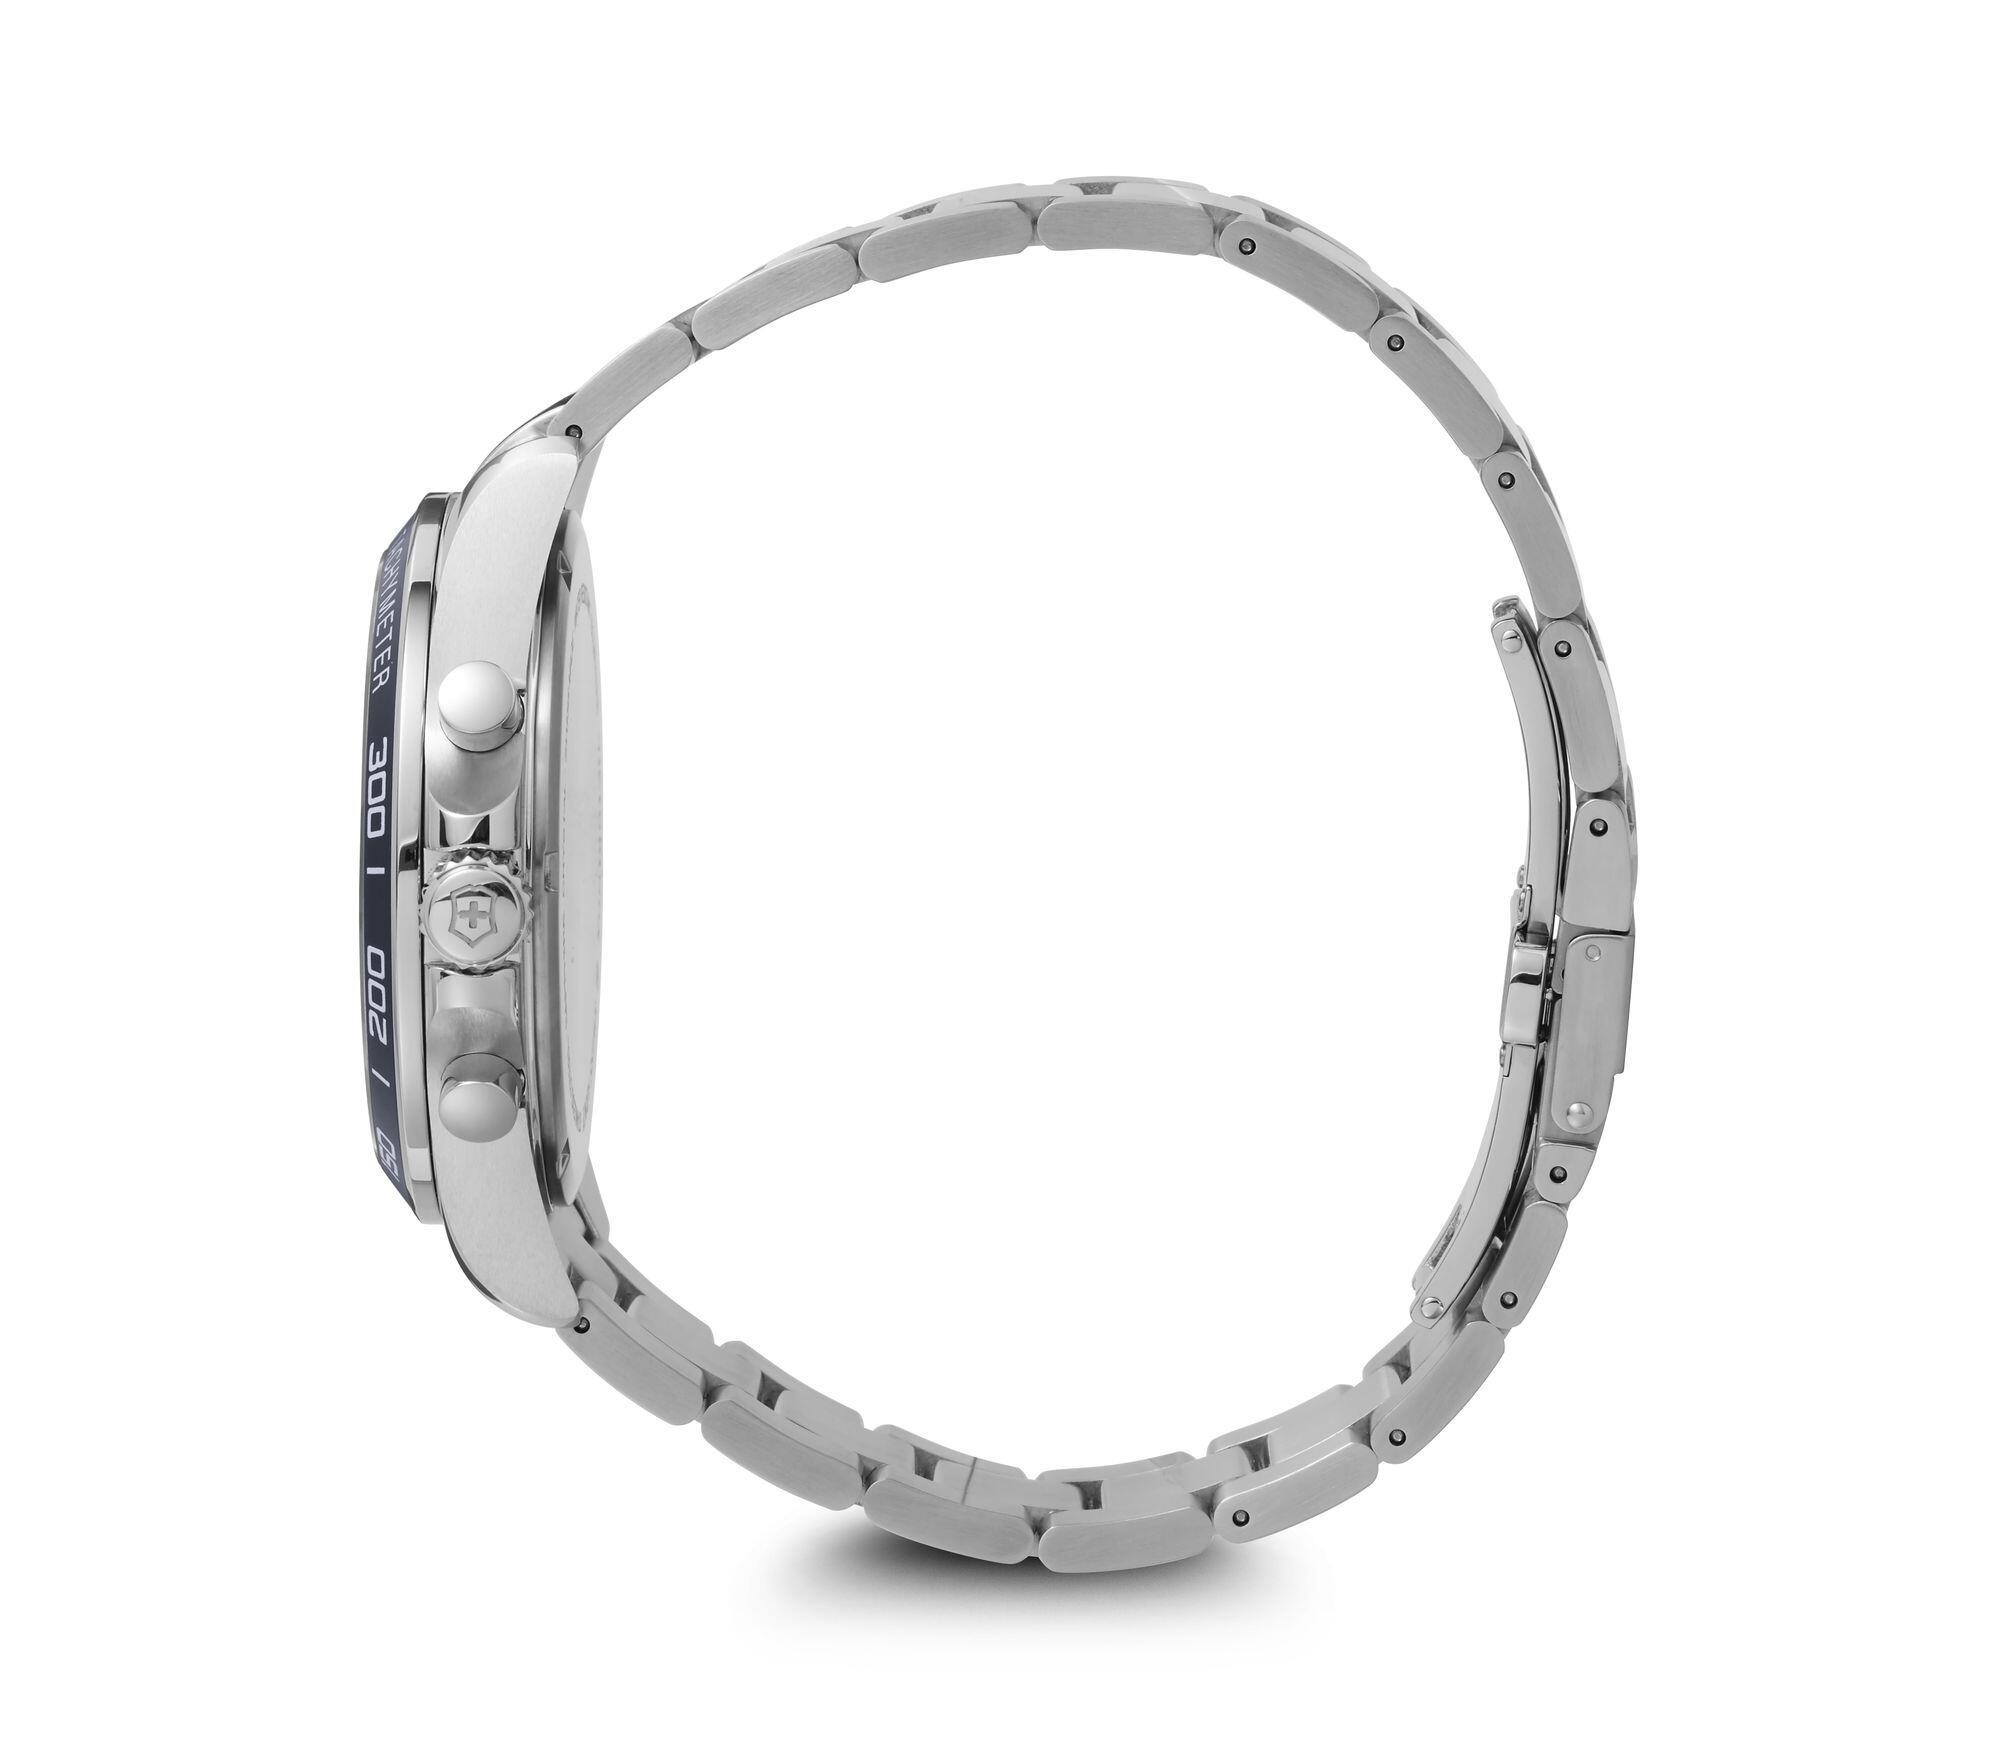 Relógio Victorinox Azul - Fieldforce Chrono - 241857